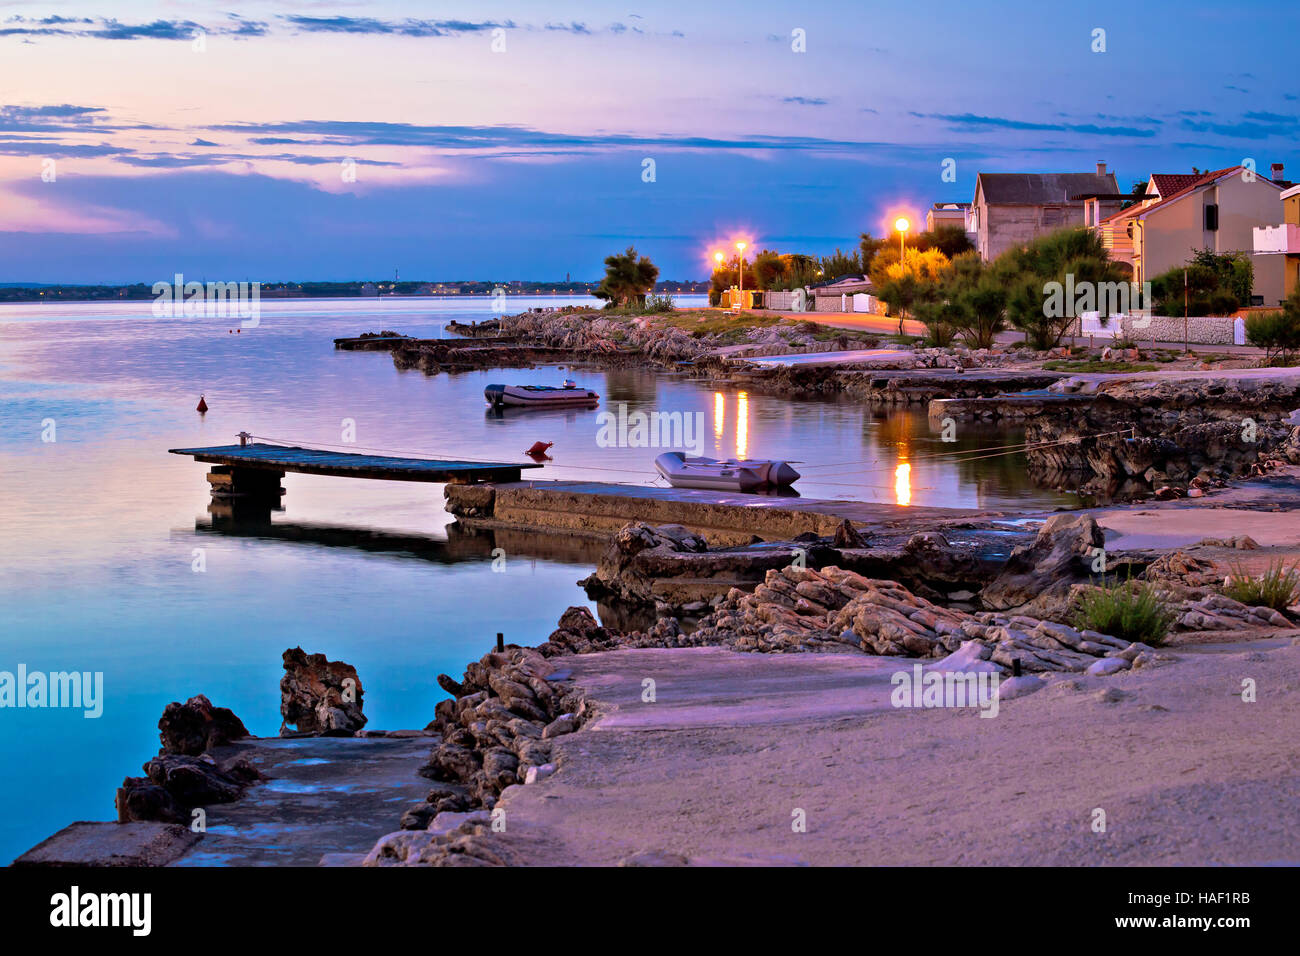 Island of Vir beach and waterfront at dawn, Dalmatia, Croatia - Stock Image